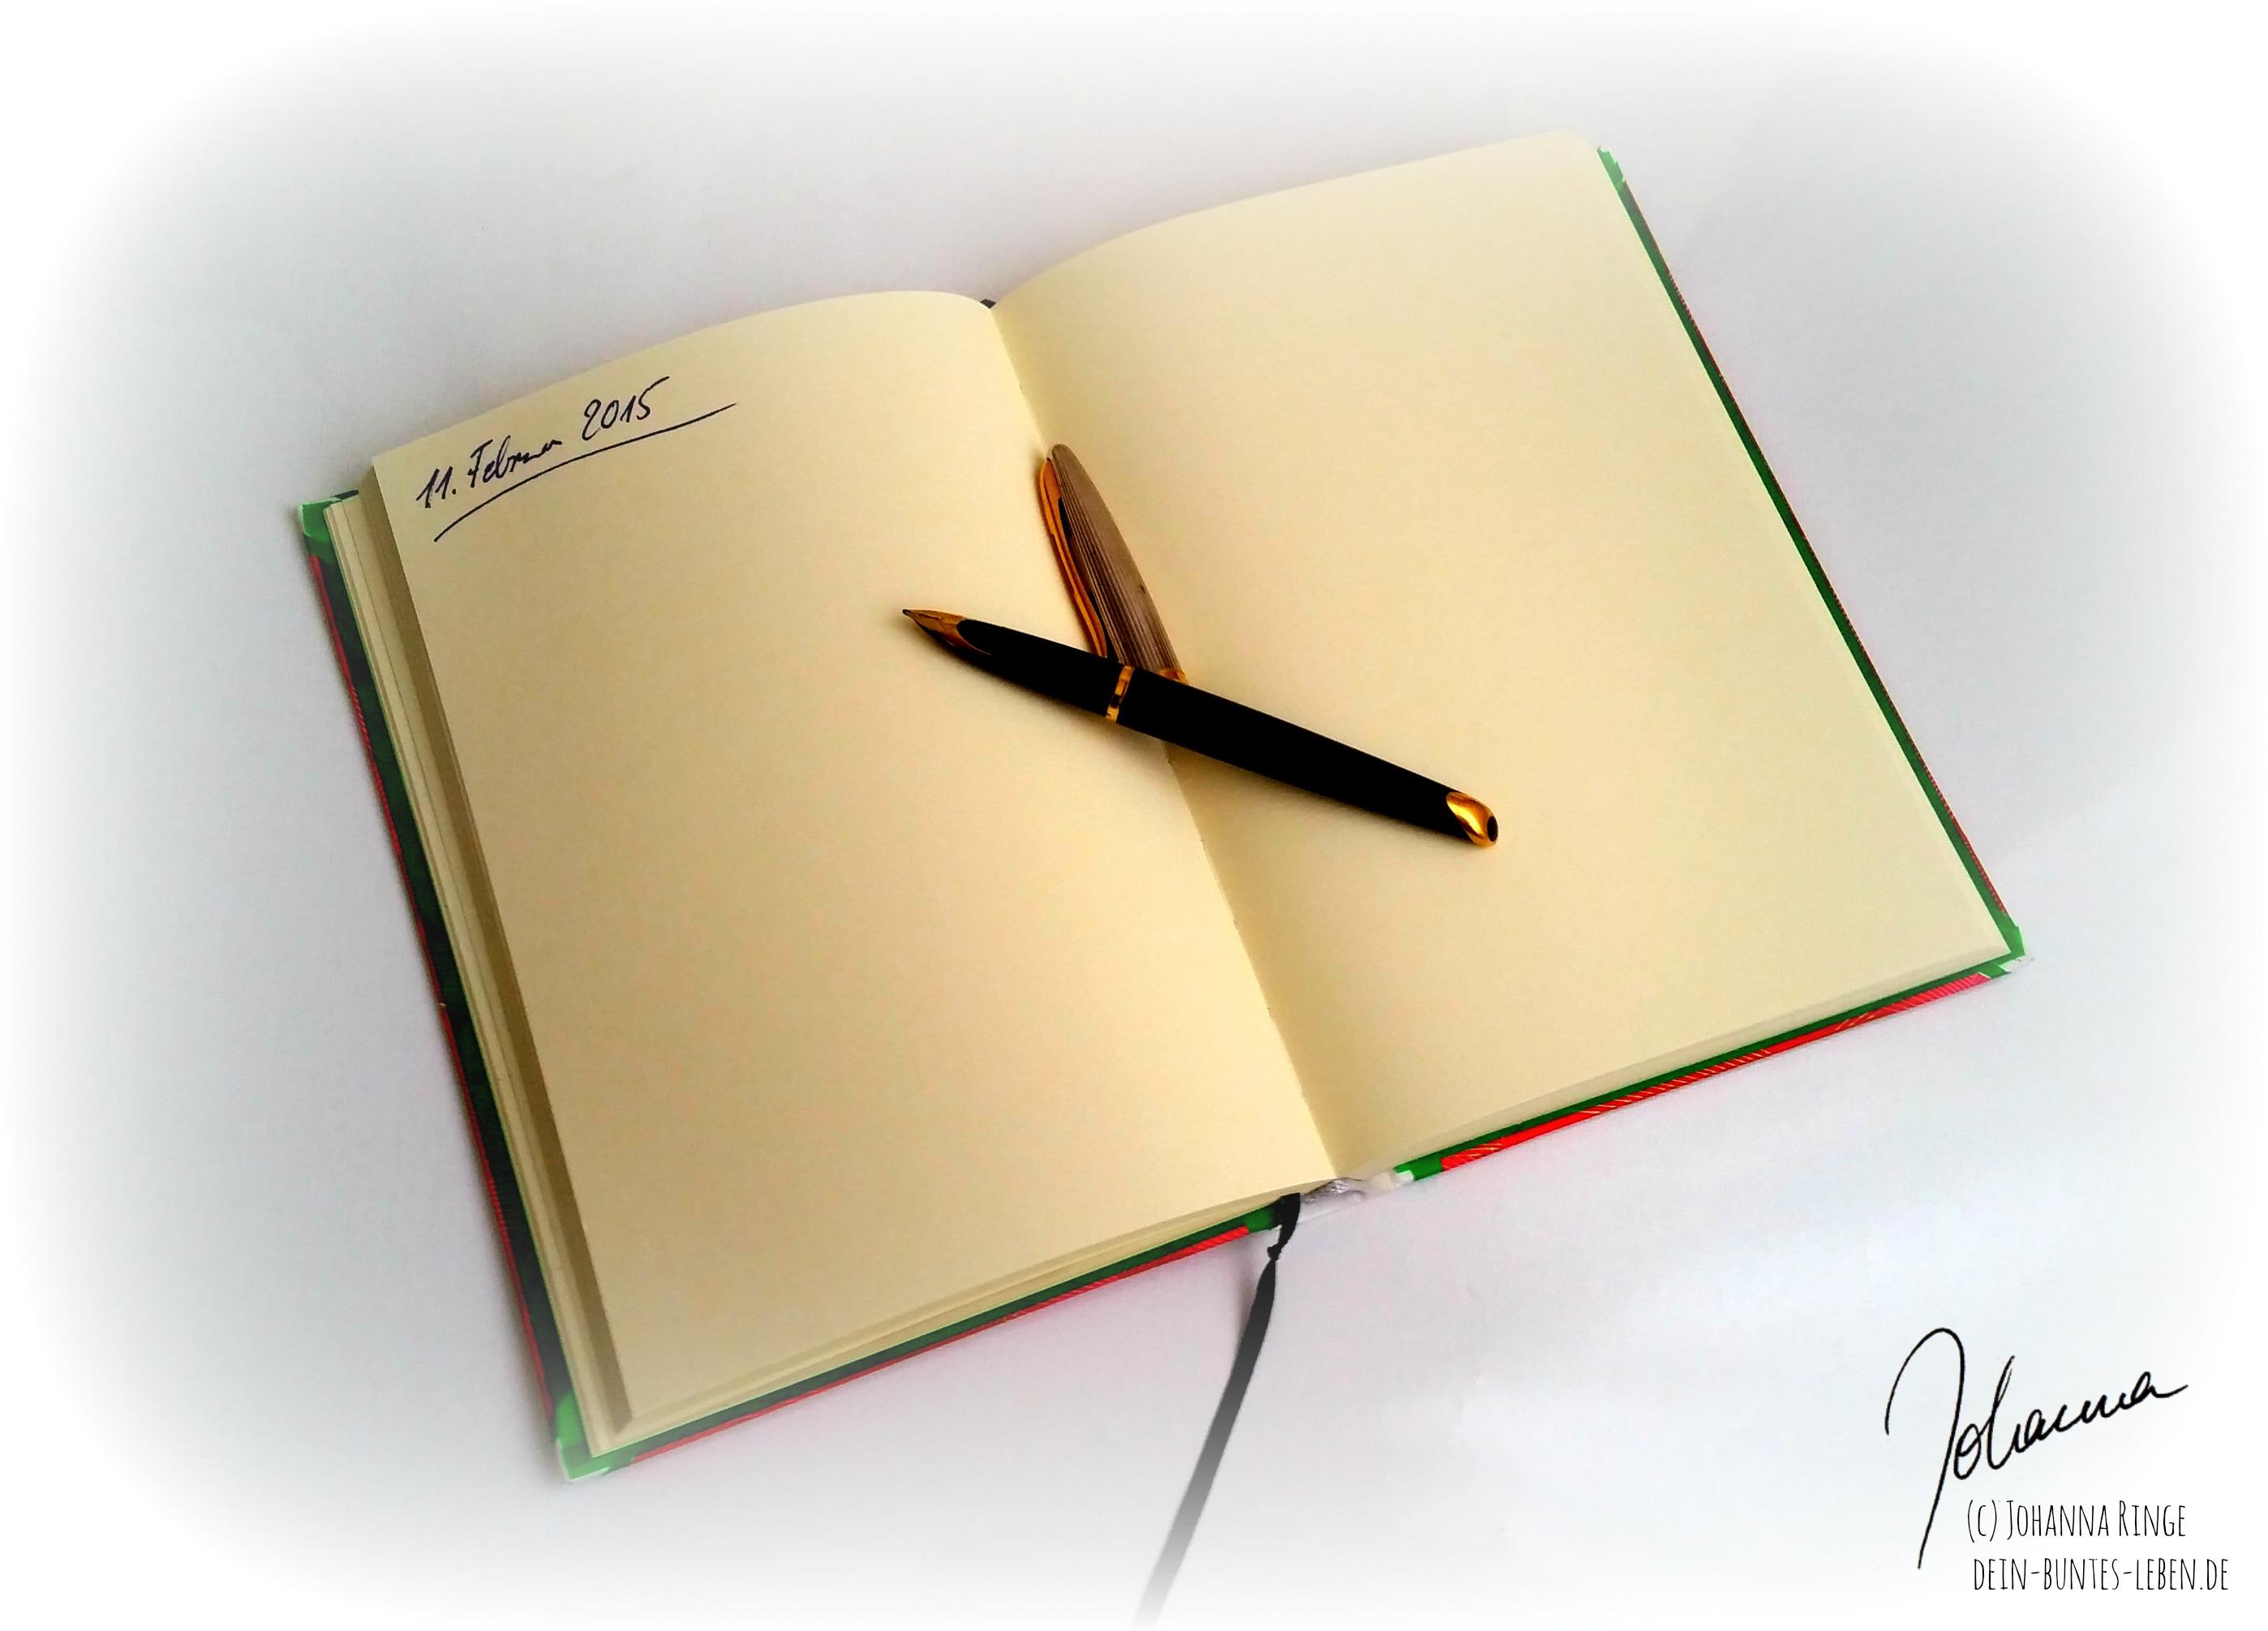 Selbstgespräch im Tagebuch (c) Johanna Ringe